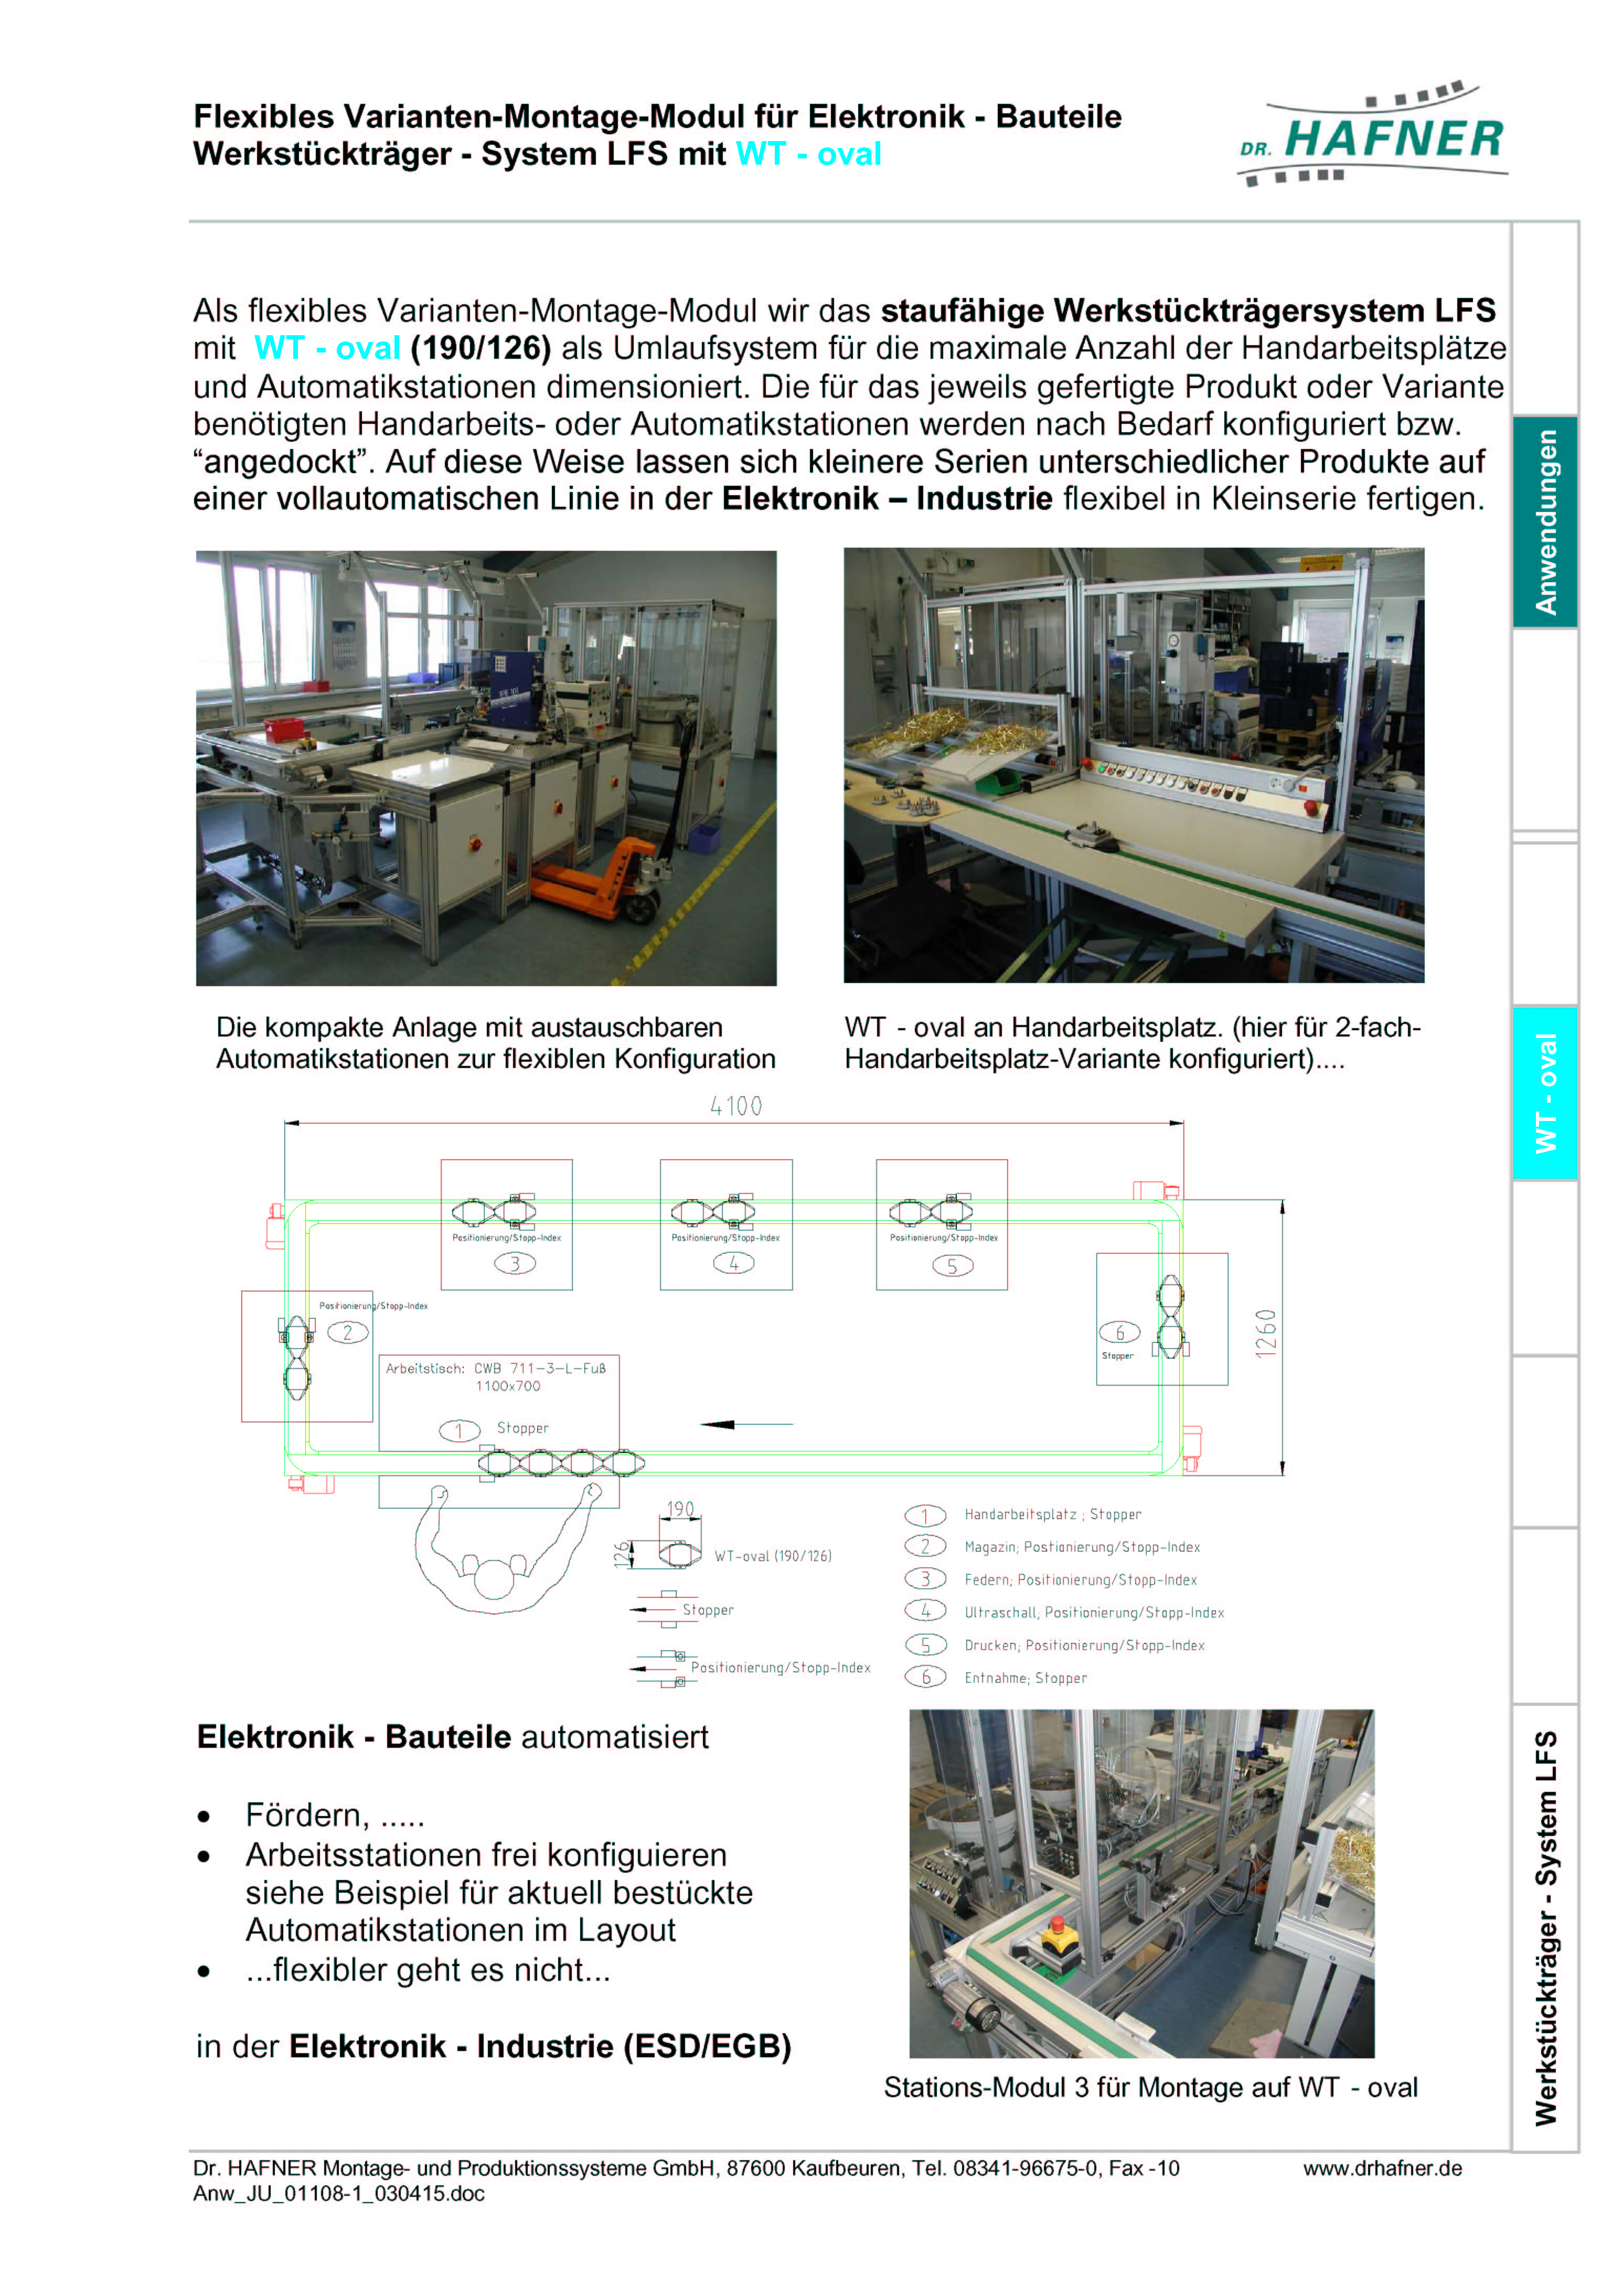 Dr. HAFNER_PKWP_26 Flexibles Varianten Montage Modul Elektronik Werkstückträger